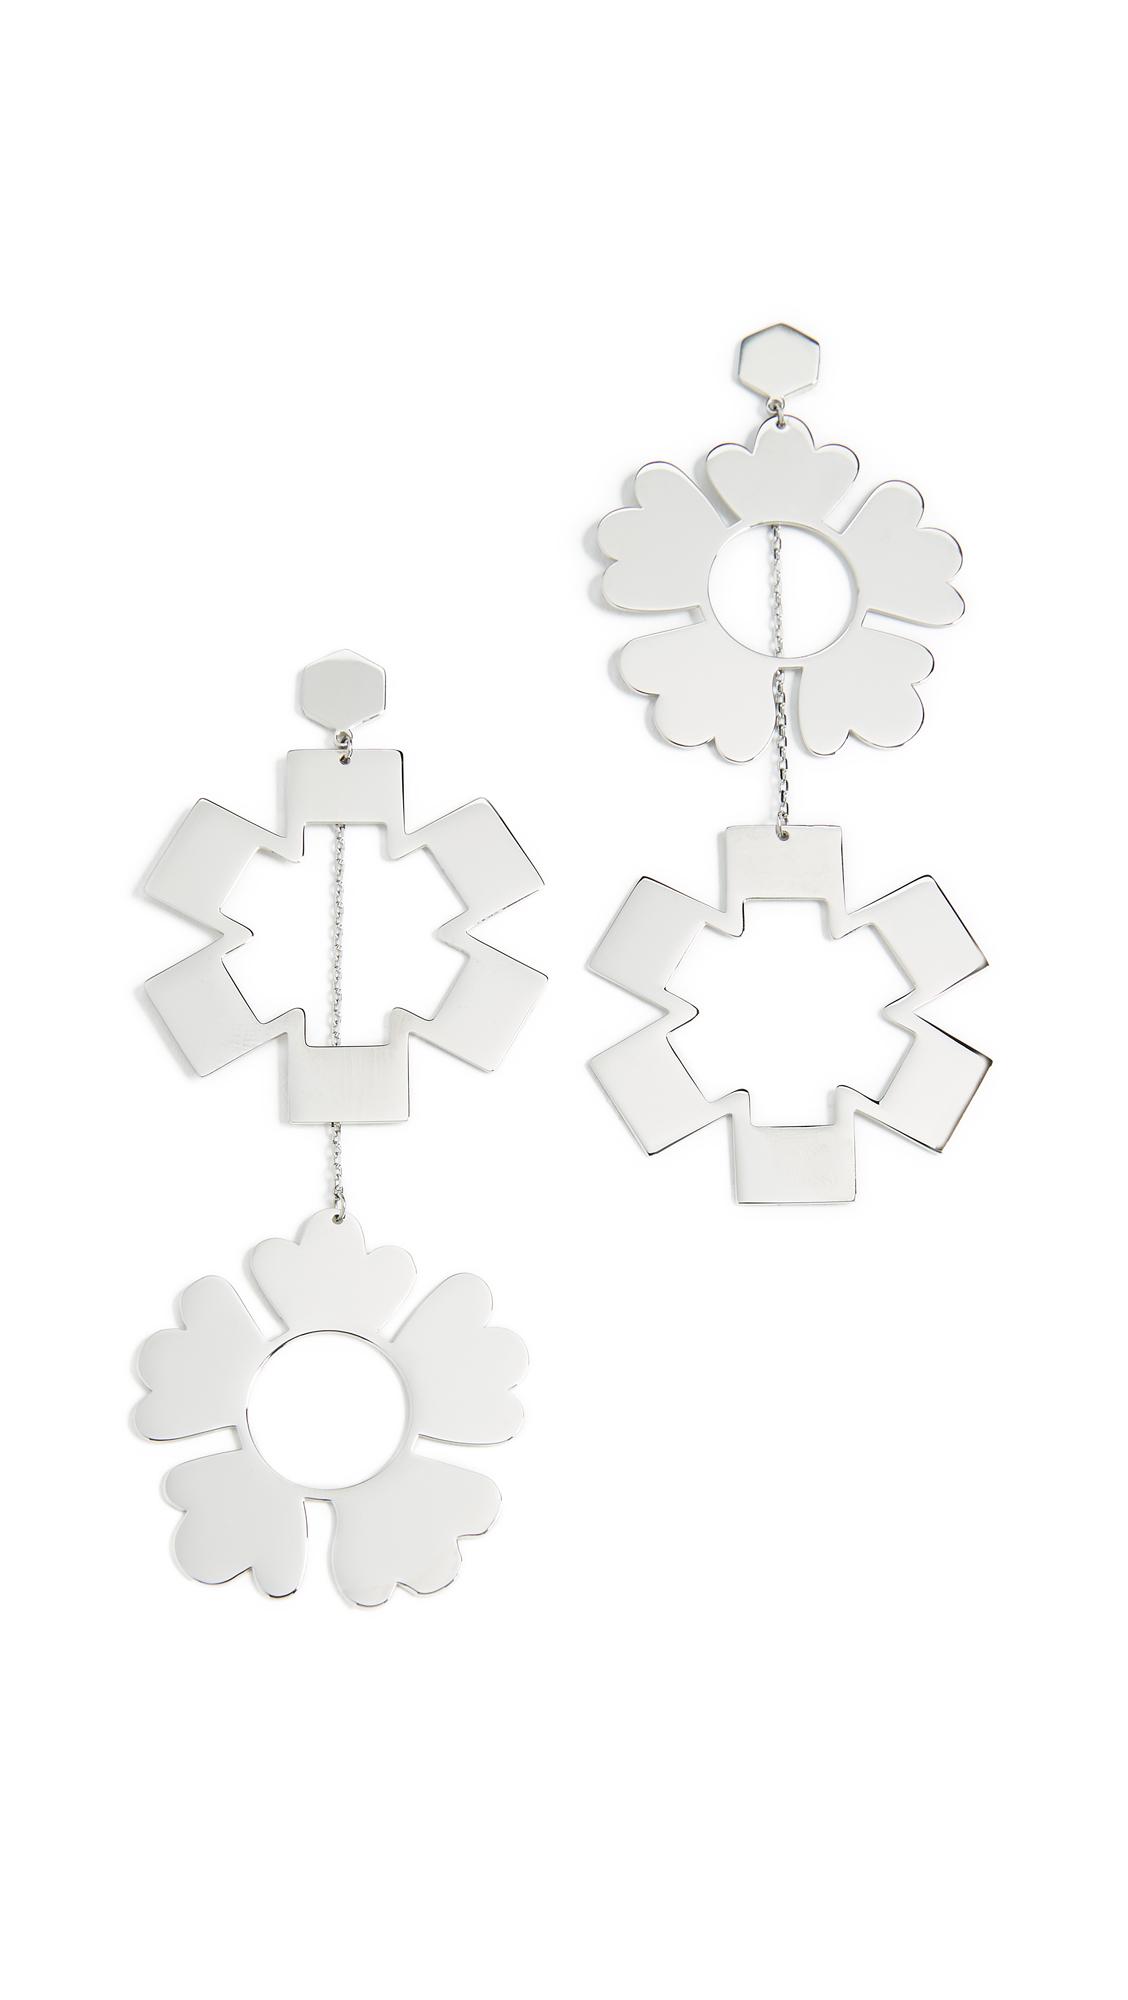 Tory Burch Geo Mismatched Drop Earrings - Silver